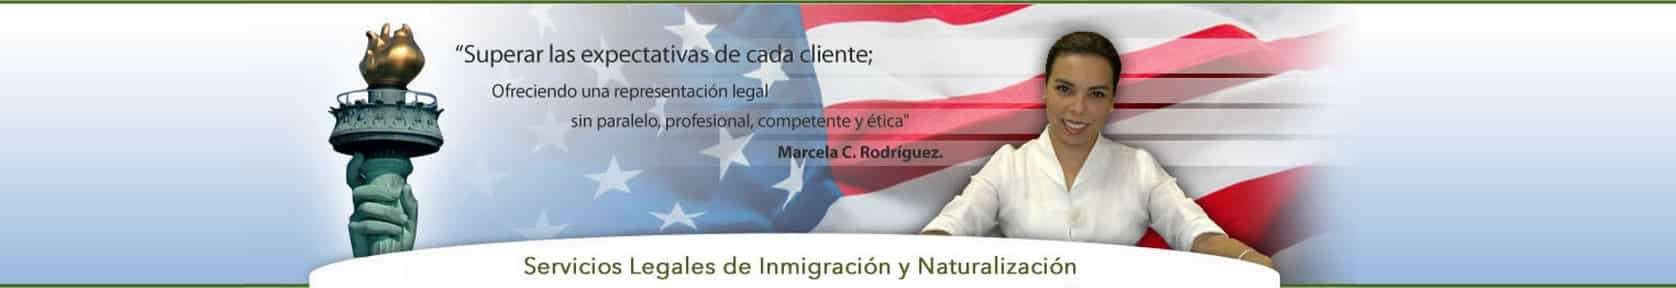 Abogado de Inmigracion en Miami Abogados s Inmigracion Miami Usa,Abogado s Inmigración Miami, Abogado s de Inmigración Miami, Abogado s Inmigración en Miami, Abogado s de Inmigración en Miami